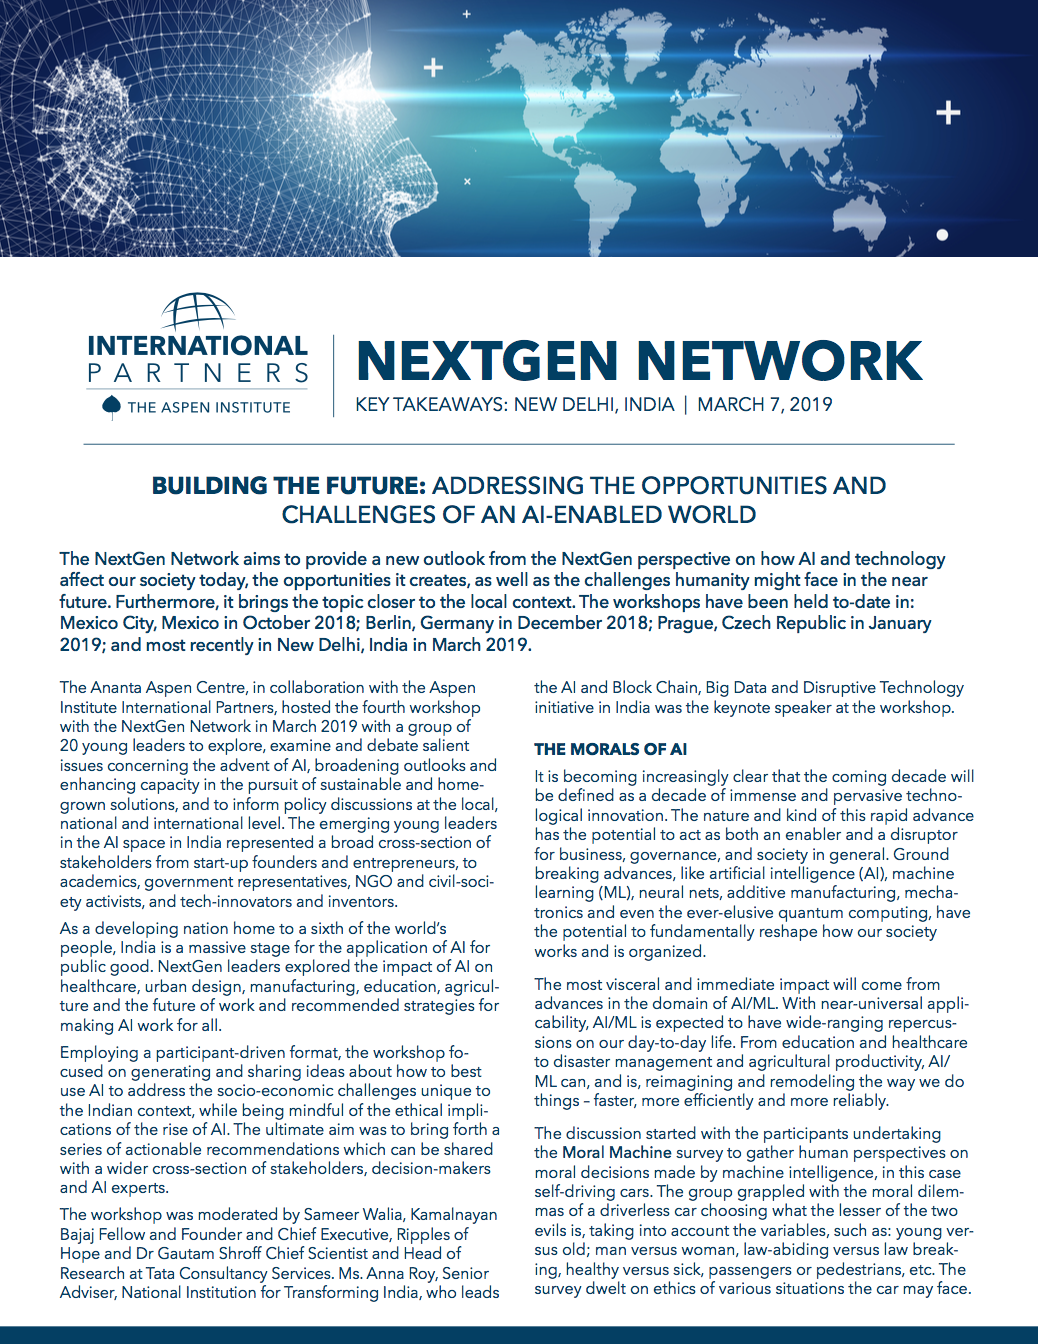 NextGen Network: New Delhi, India